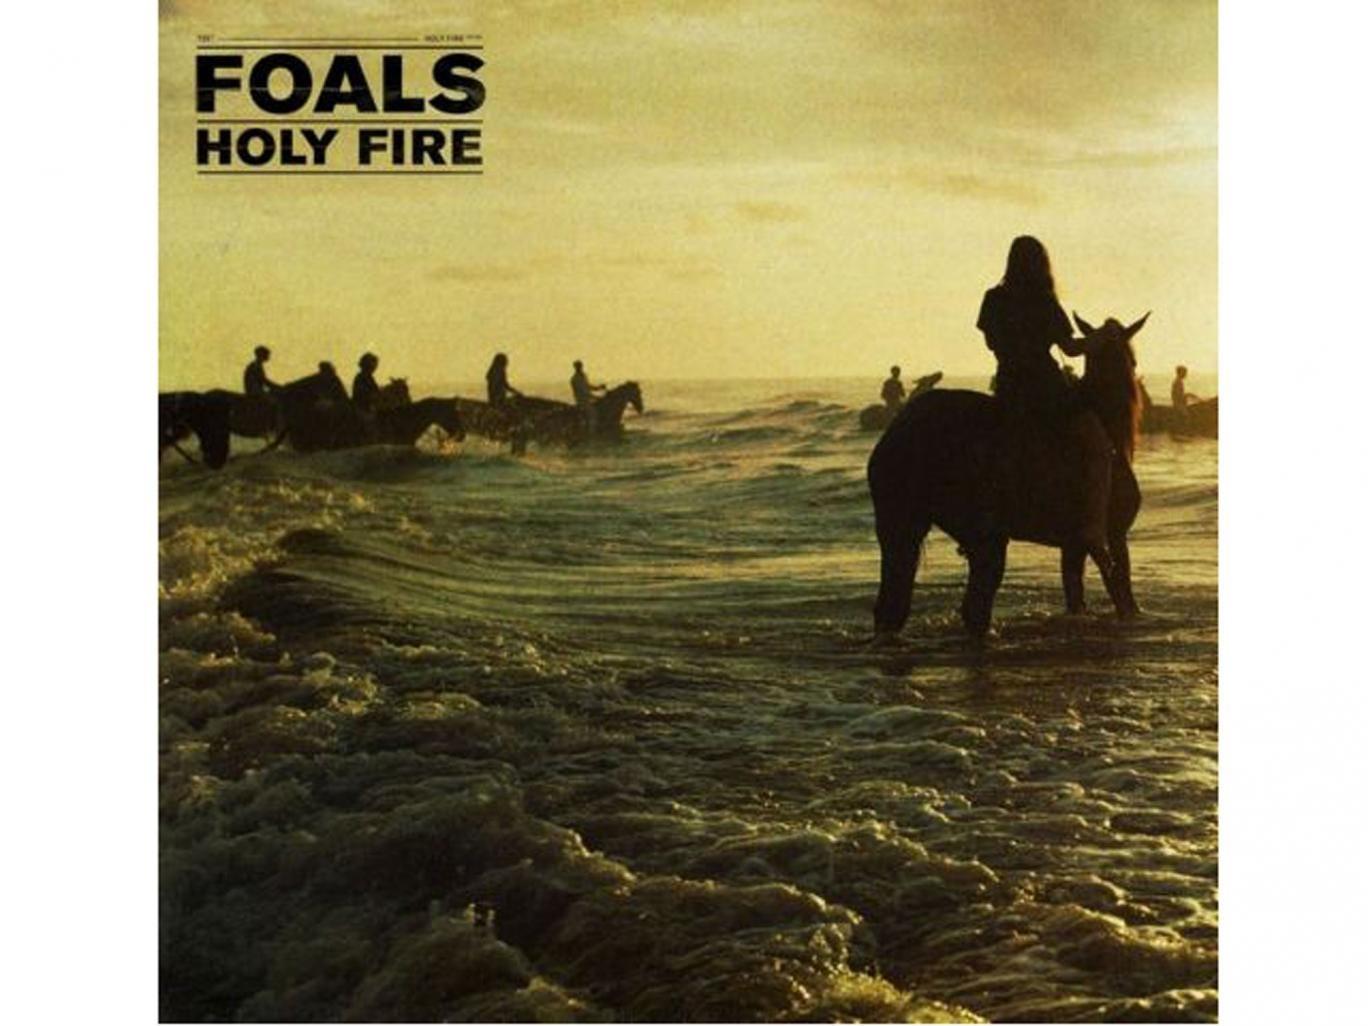 Foals, Holy Fire (Transgressive)